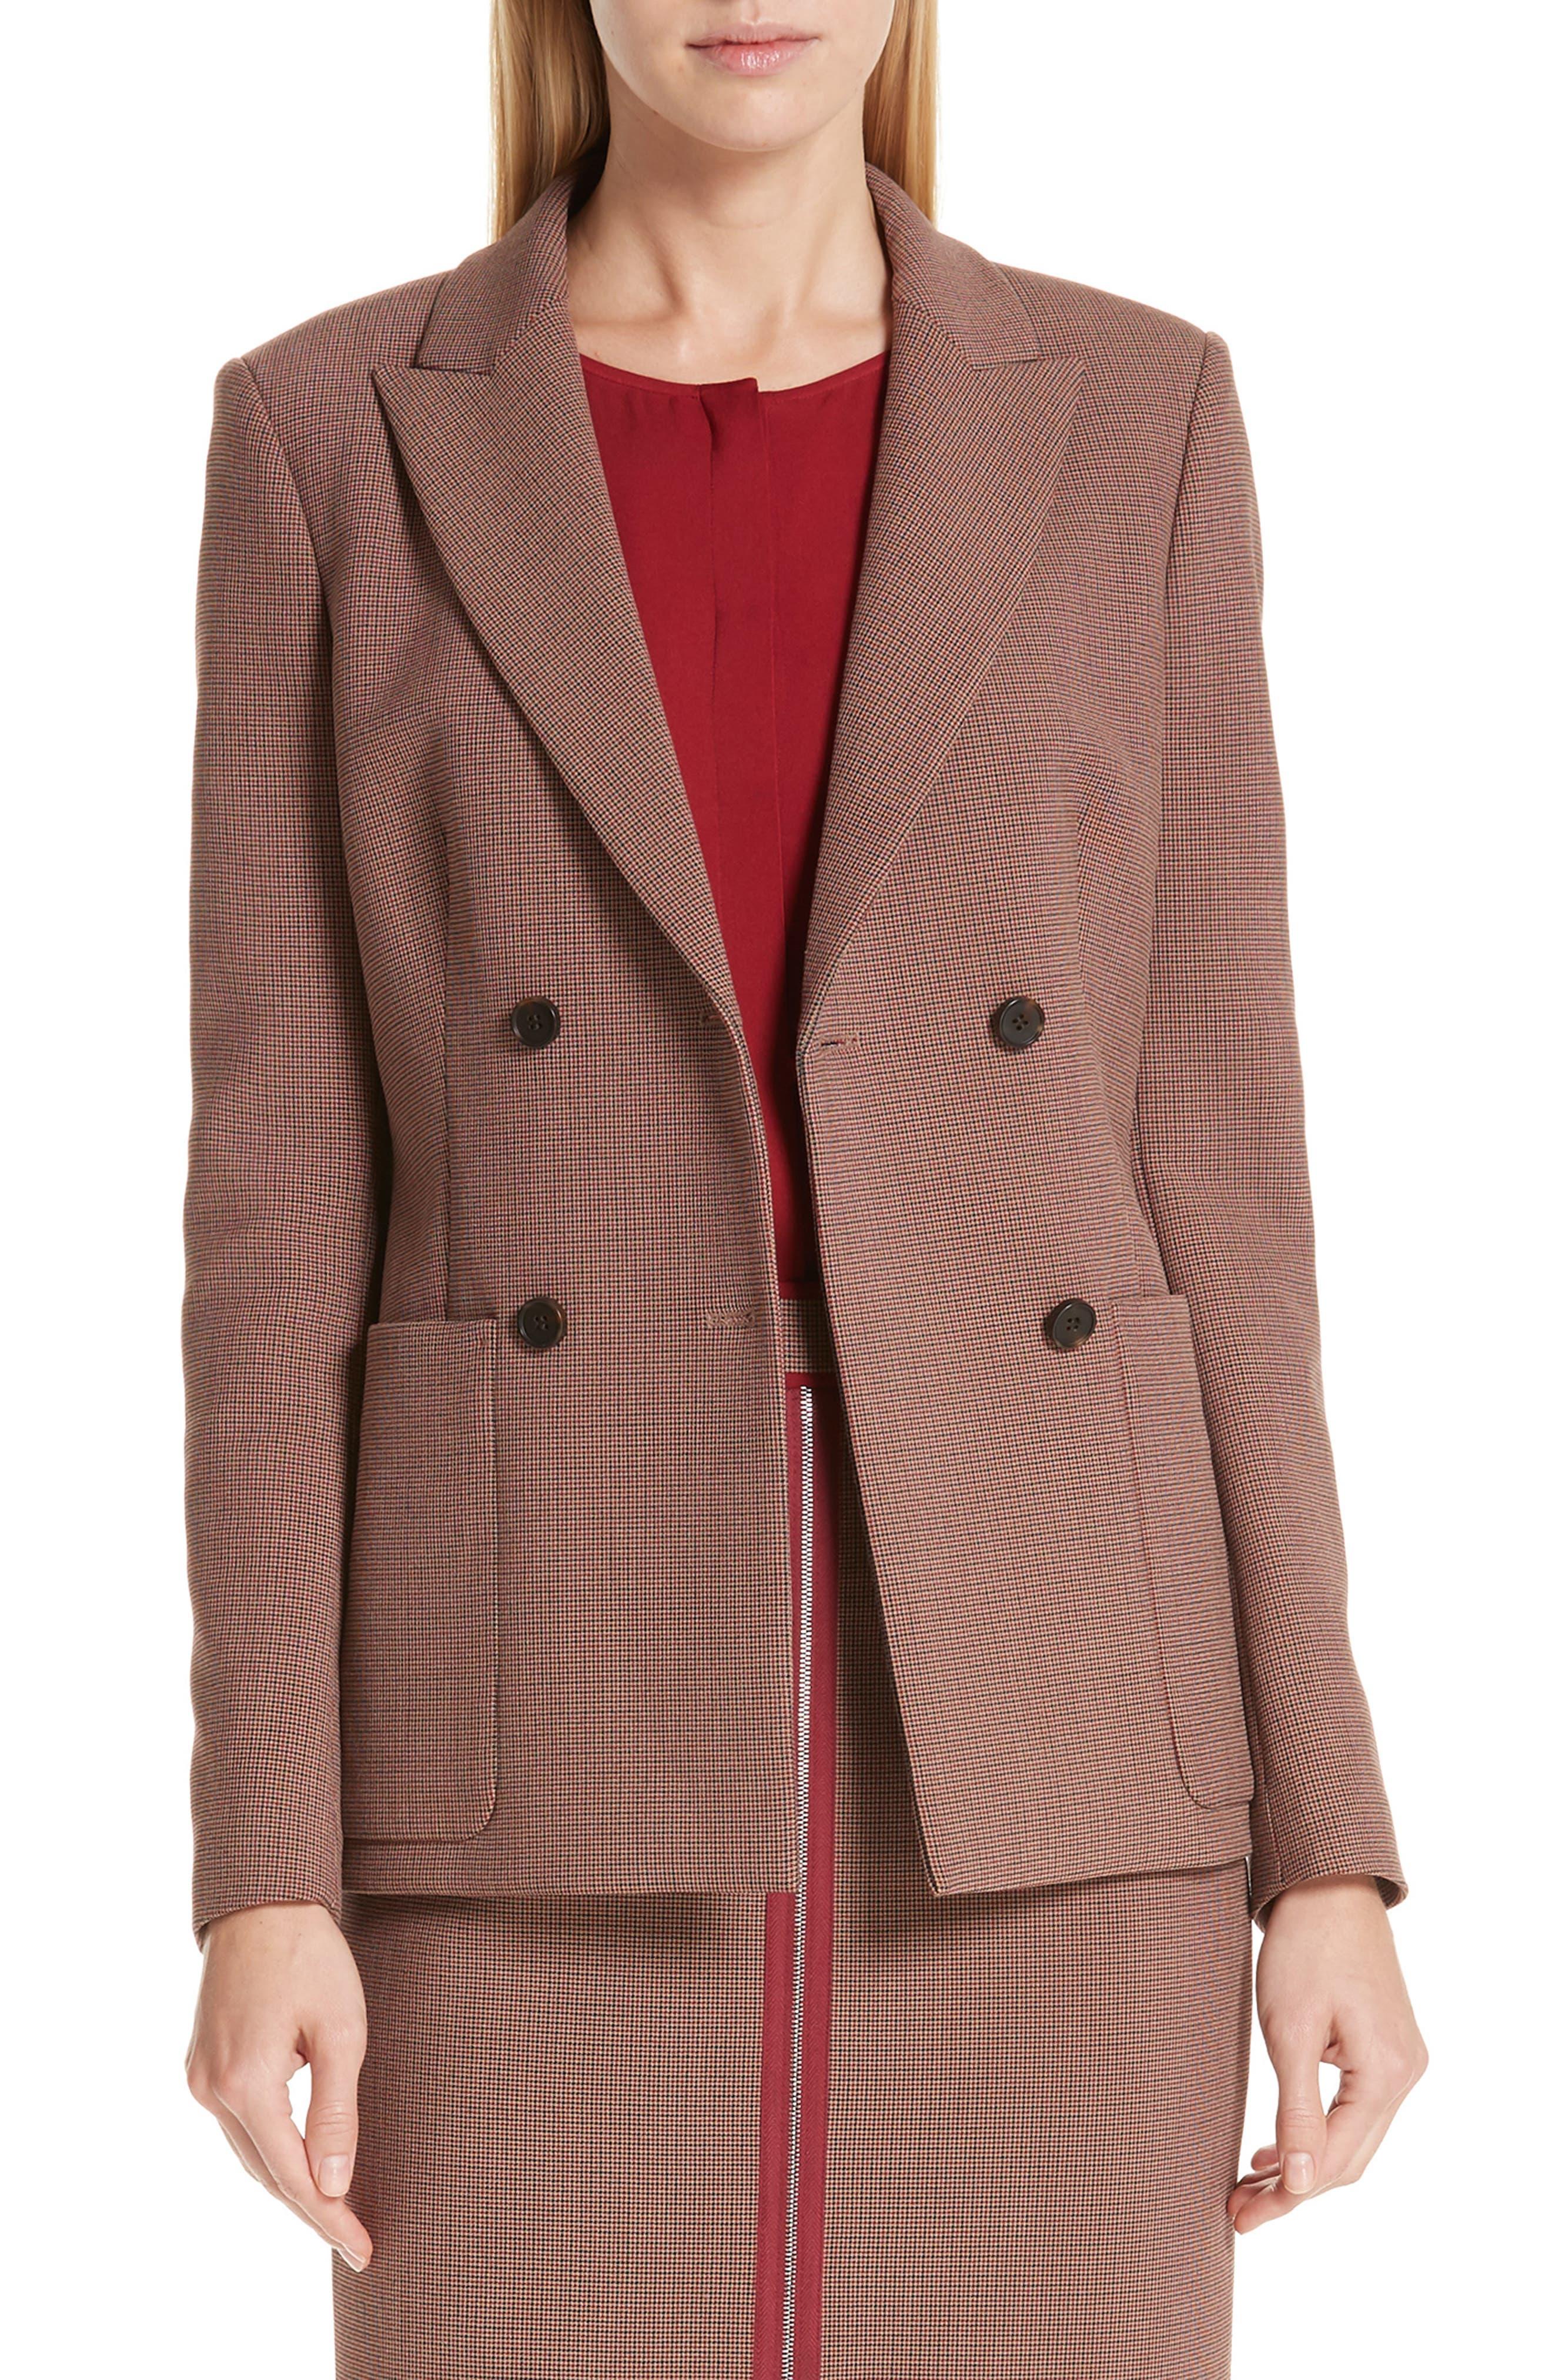 Joliviena Check Suit Jacket,                             Main thumbnail 1, color,                             DARK RED CHECK